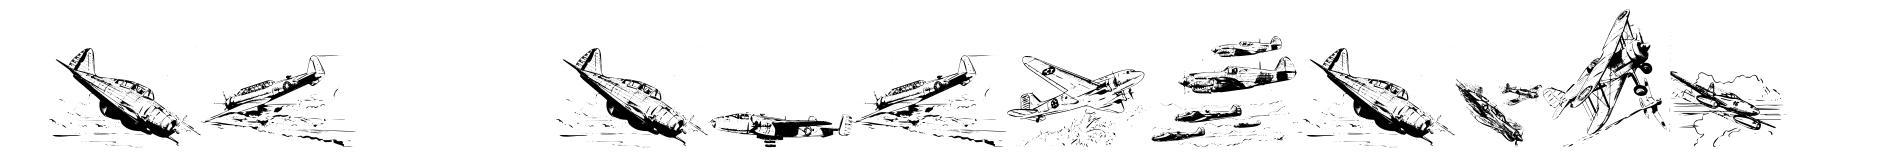 War II Wairplanes